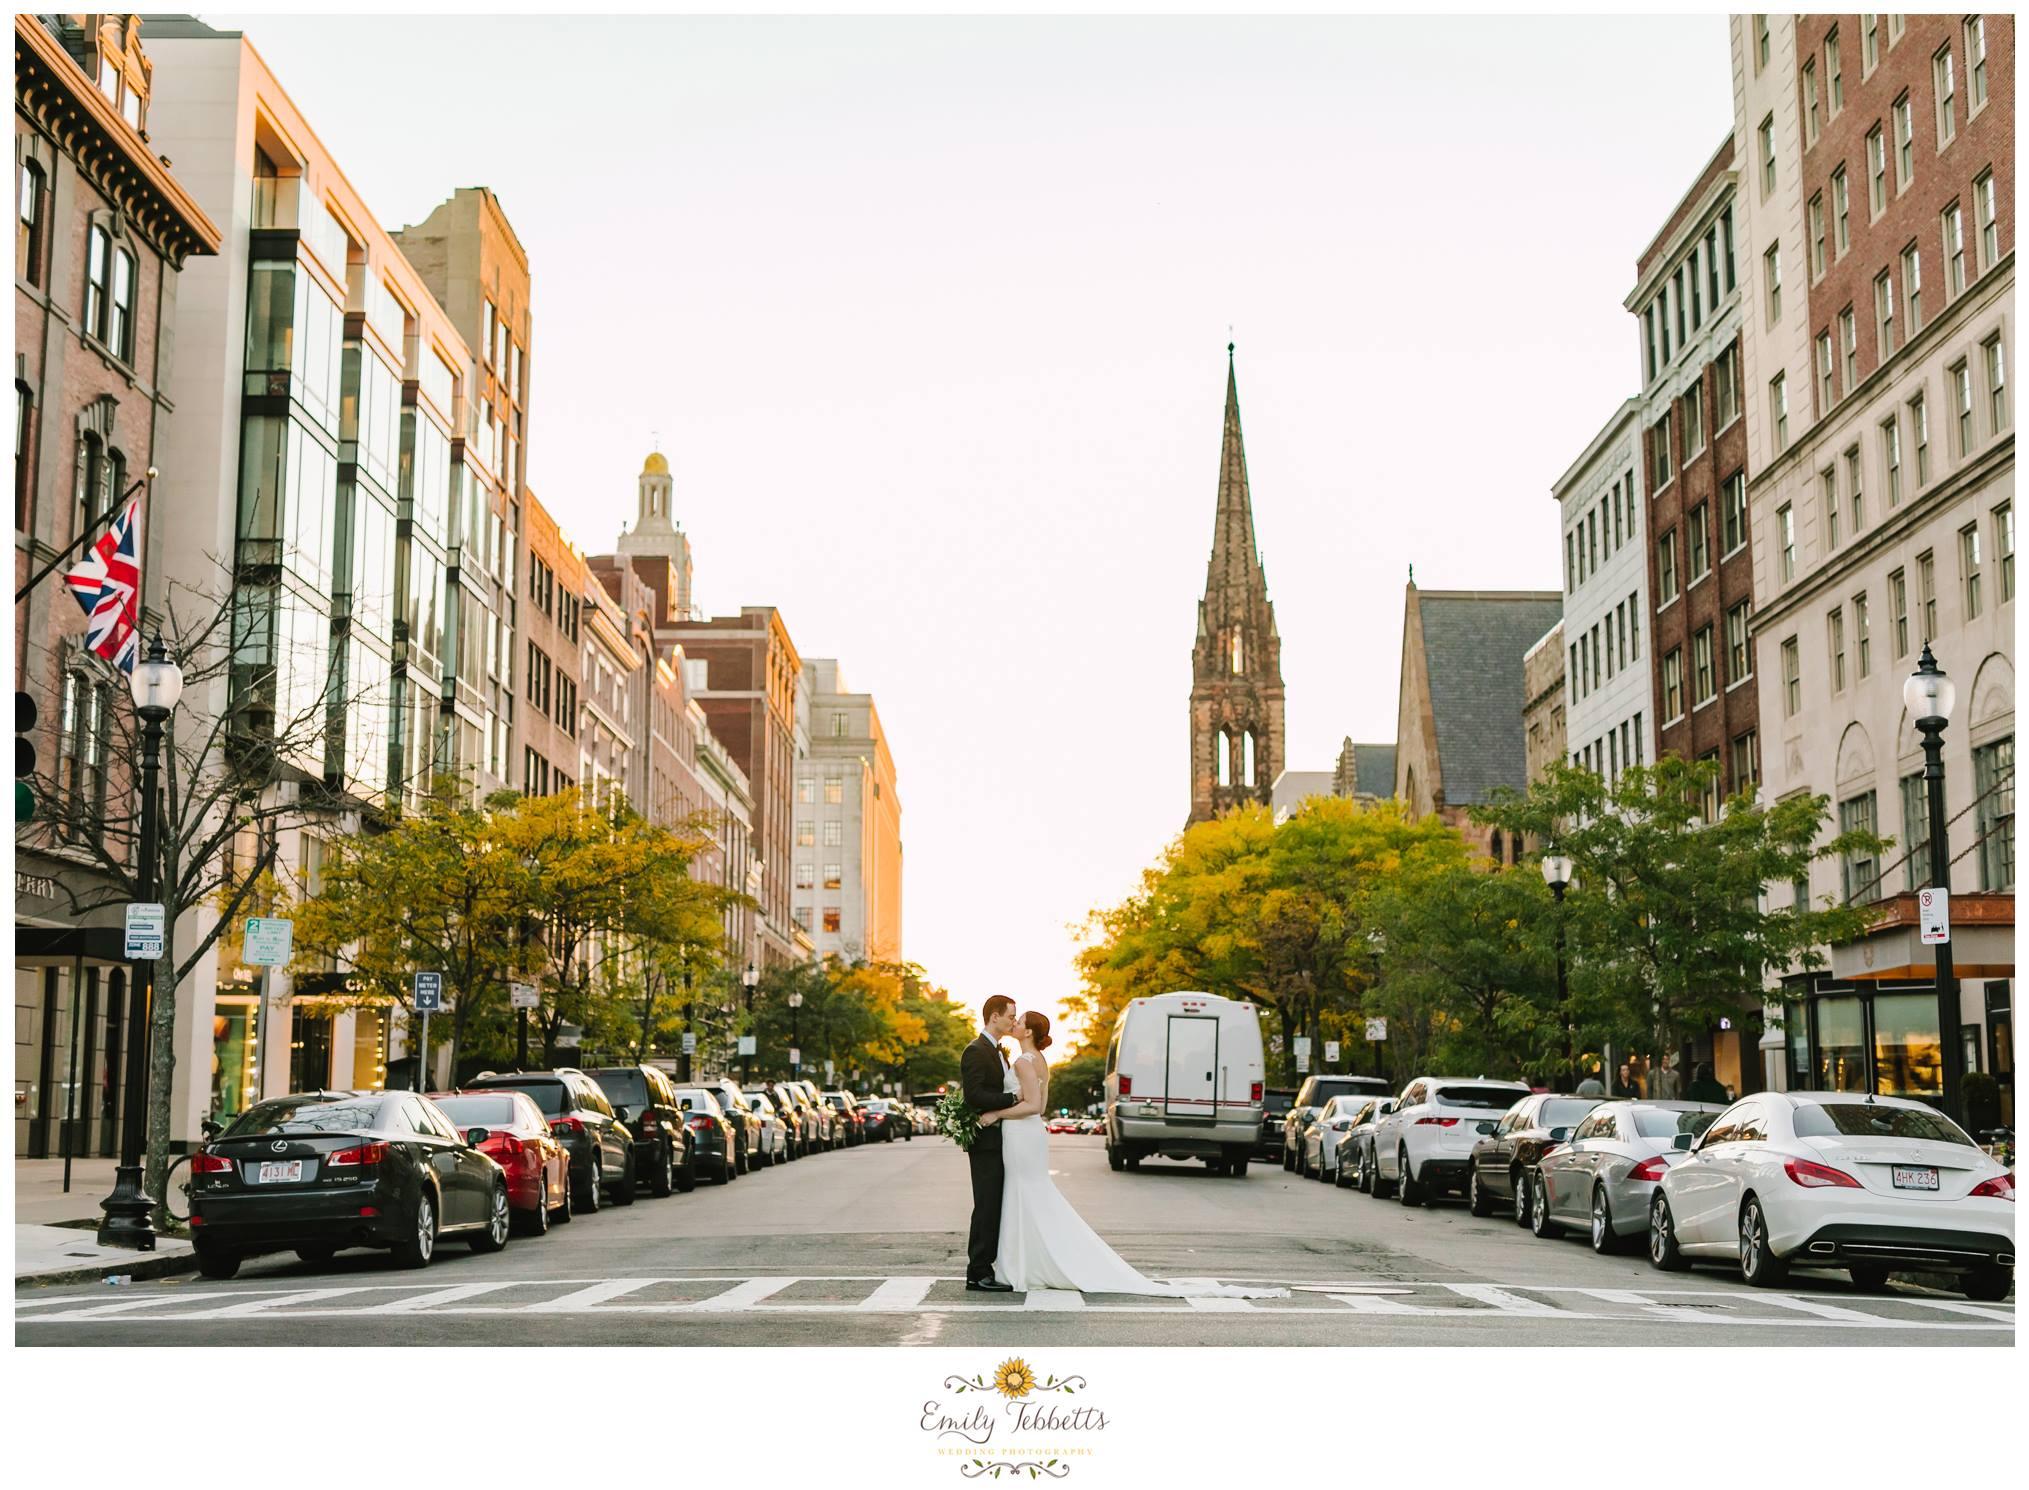 Boston, MA - Emily Tebbetts Wedding Photography 2.jpg